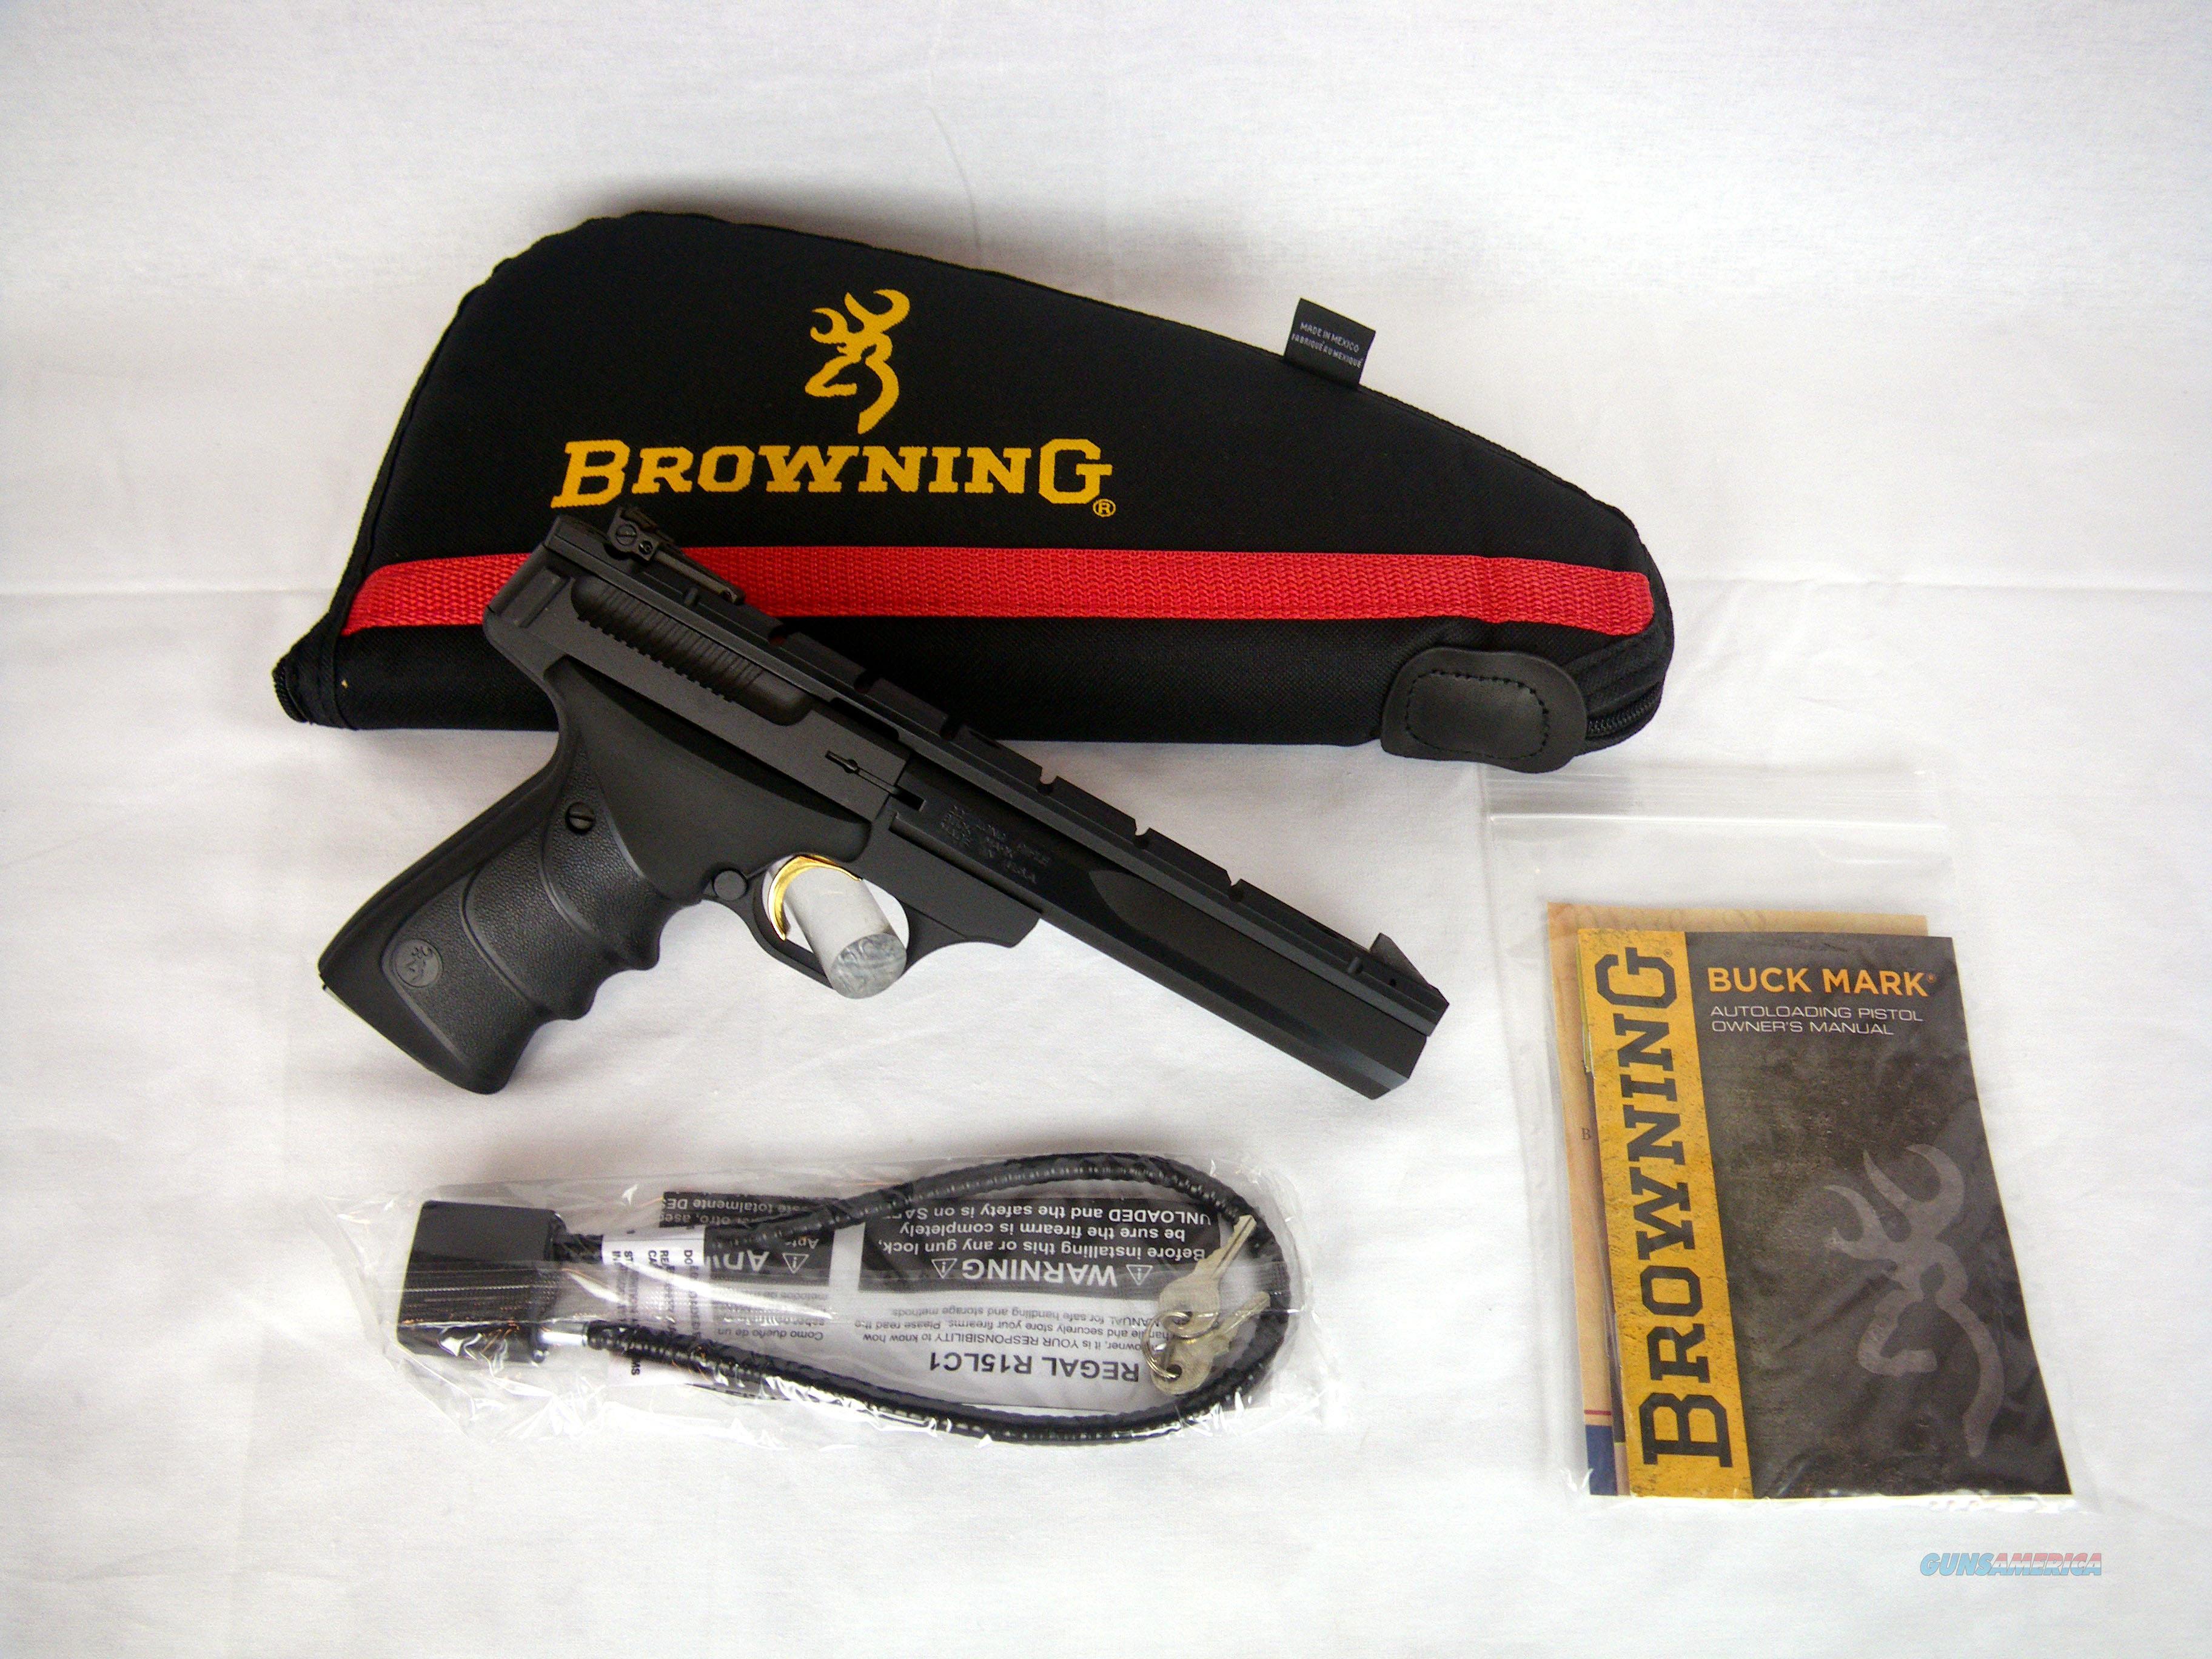 "Browning Buckmark Contour URX 22lr 5.5"" NEW W/Rail #051421490  Guns > Pistols > Browning Pistols > Buckmark"